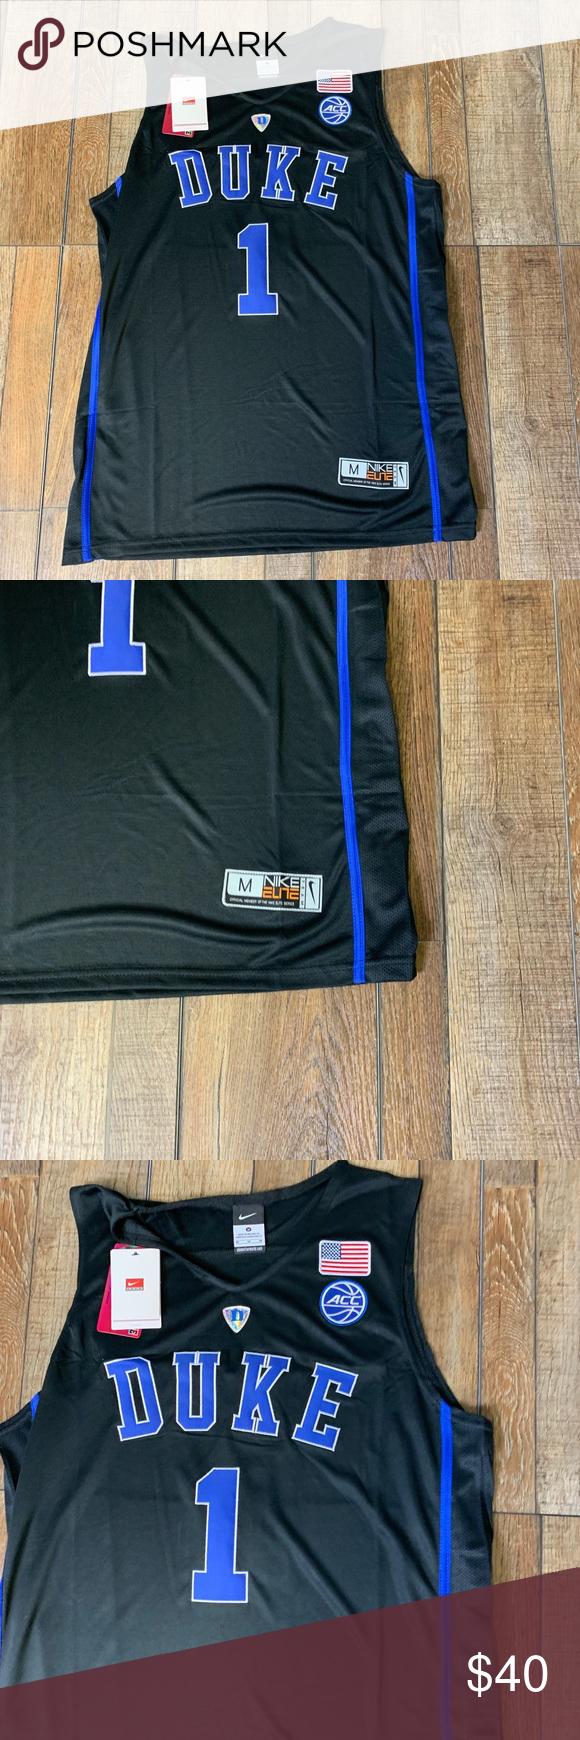 NWT Zion Williamson Duke University Jersey 🔥🔥🔥 Brand New Zion Jersey  Duke Blue Devils a02eae63f